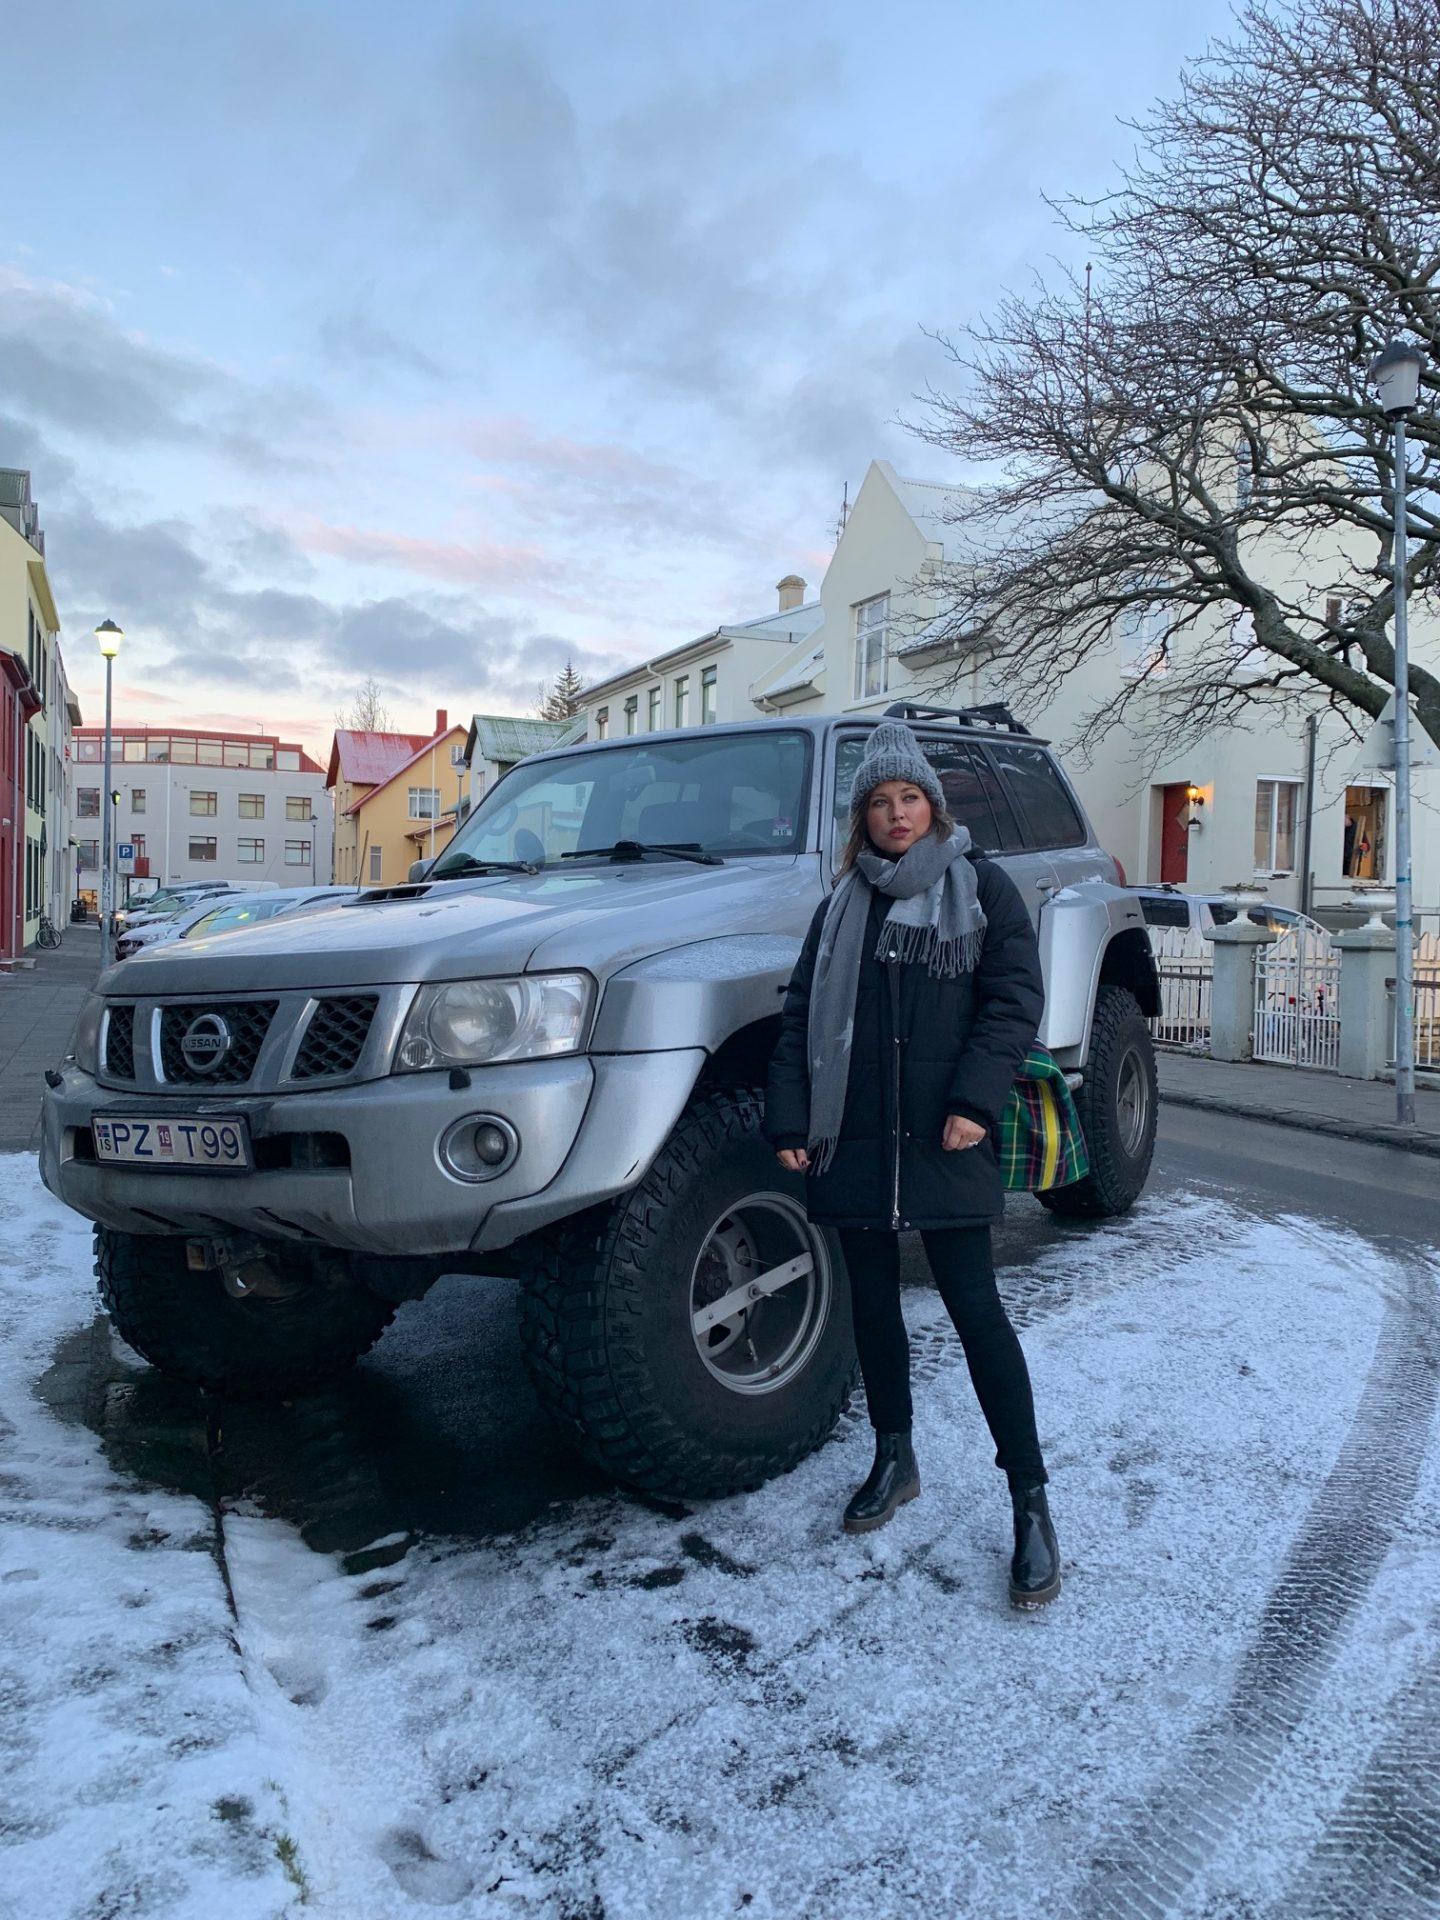 manchester fashion blogger, manchester bloggers, travel blogger, Reykjavik, Iceland Reykjavik, visit Reykjavik, visit Reykjavik, fashion blogger